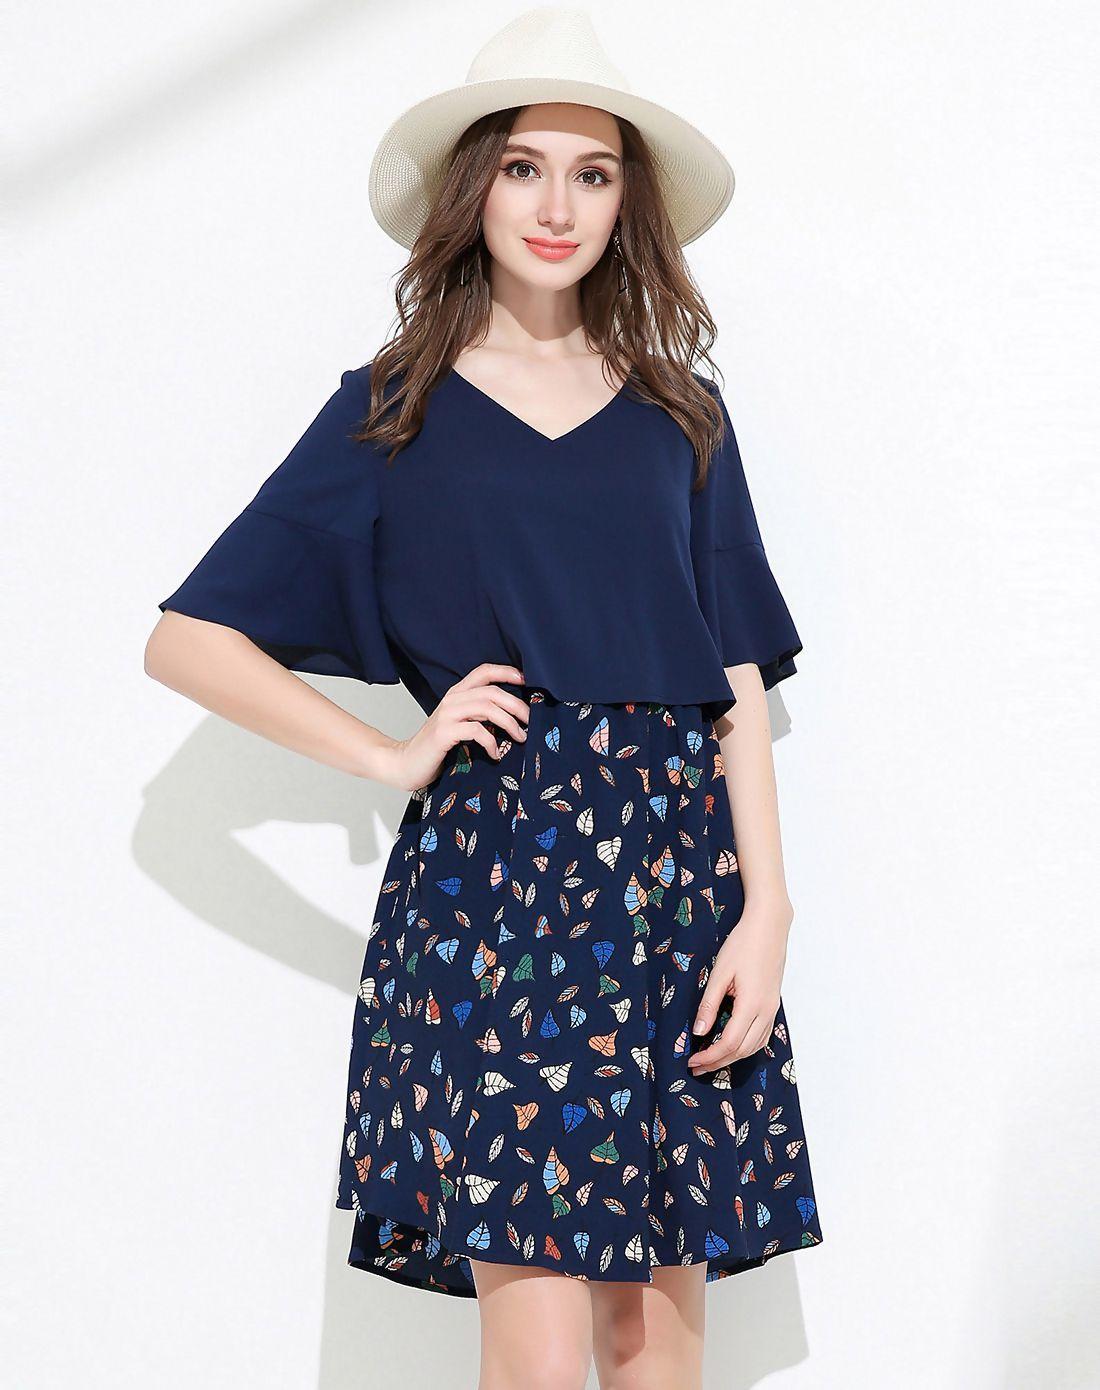 Meidongtai royal blue floral v neck bell knee length aline dress